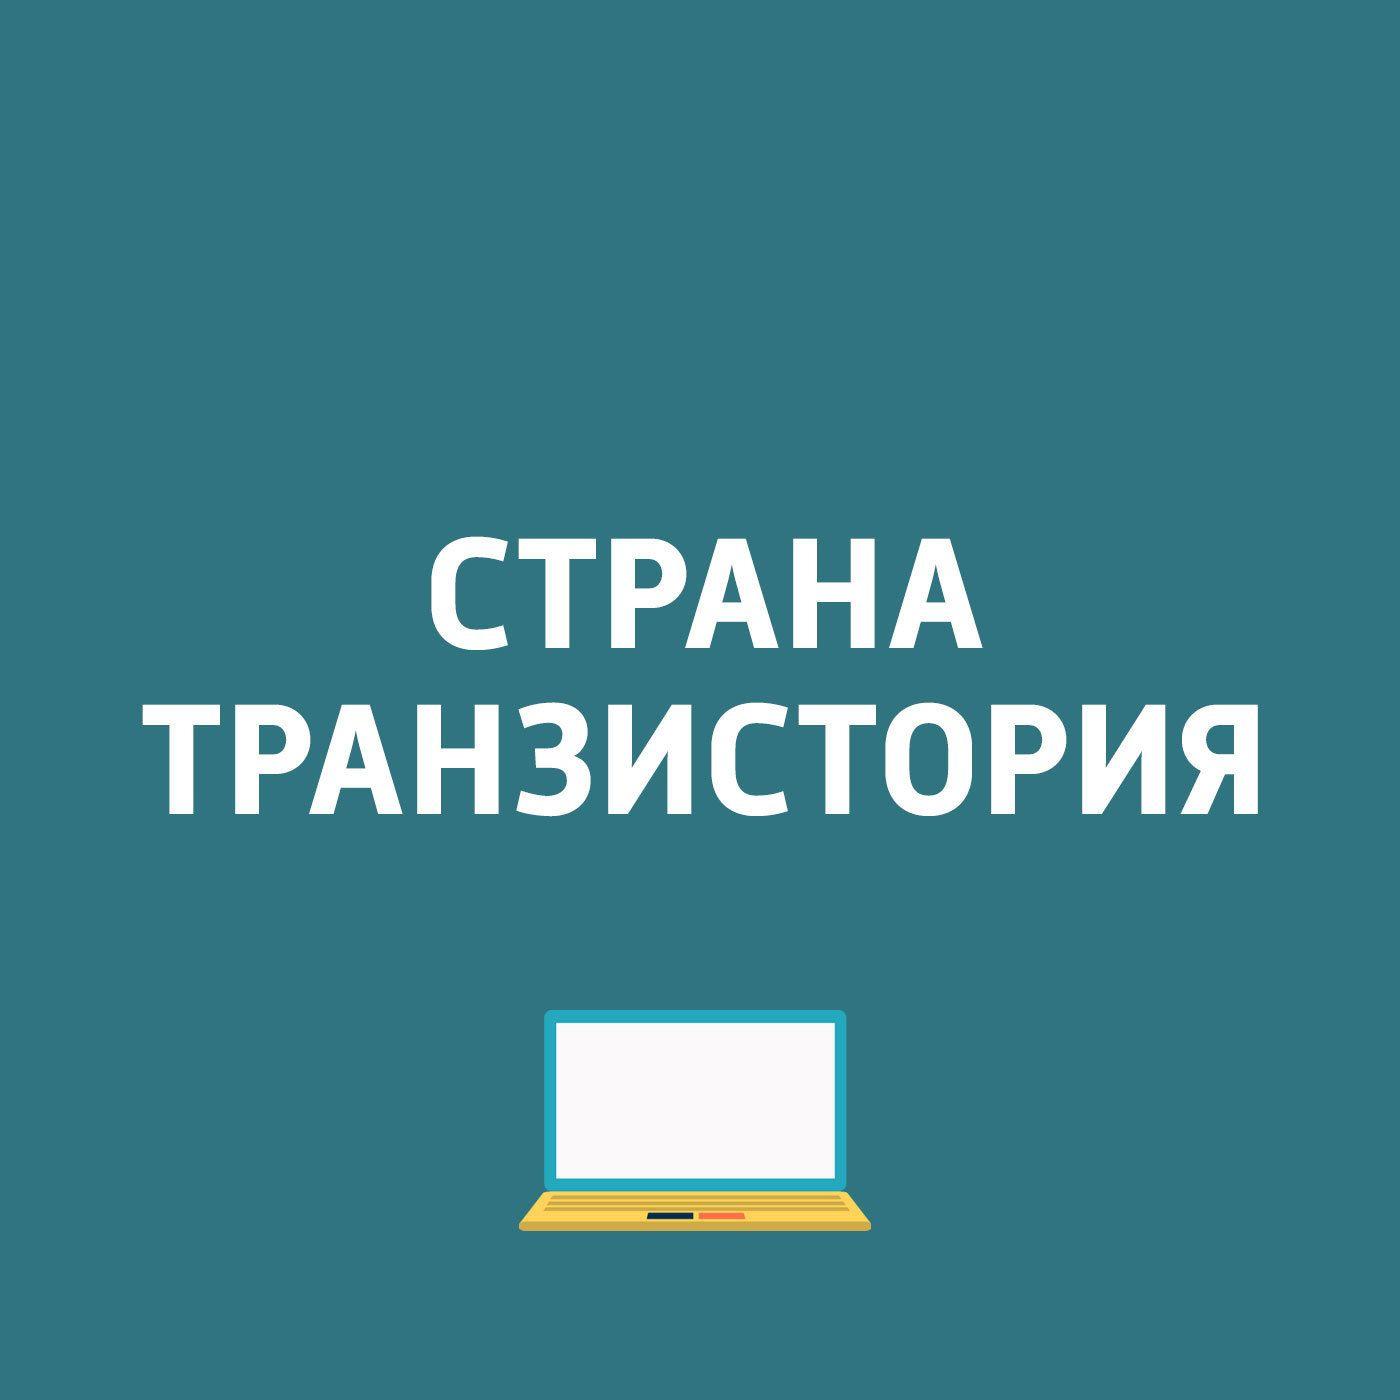 Картаев Павел Тест наушников Plantronics BackBeat Fit 3100; Xiaomi Mi 9 и Redmi 7; роуминг Мегафона